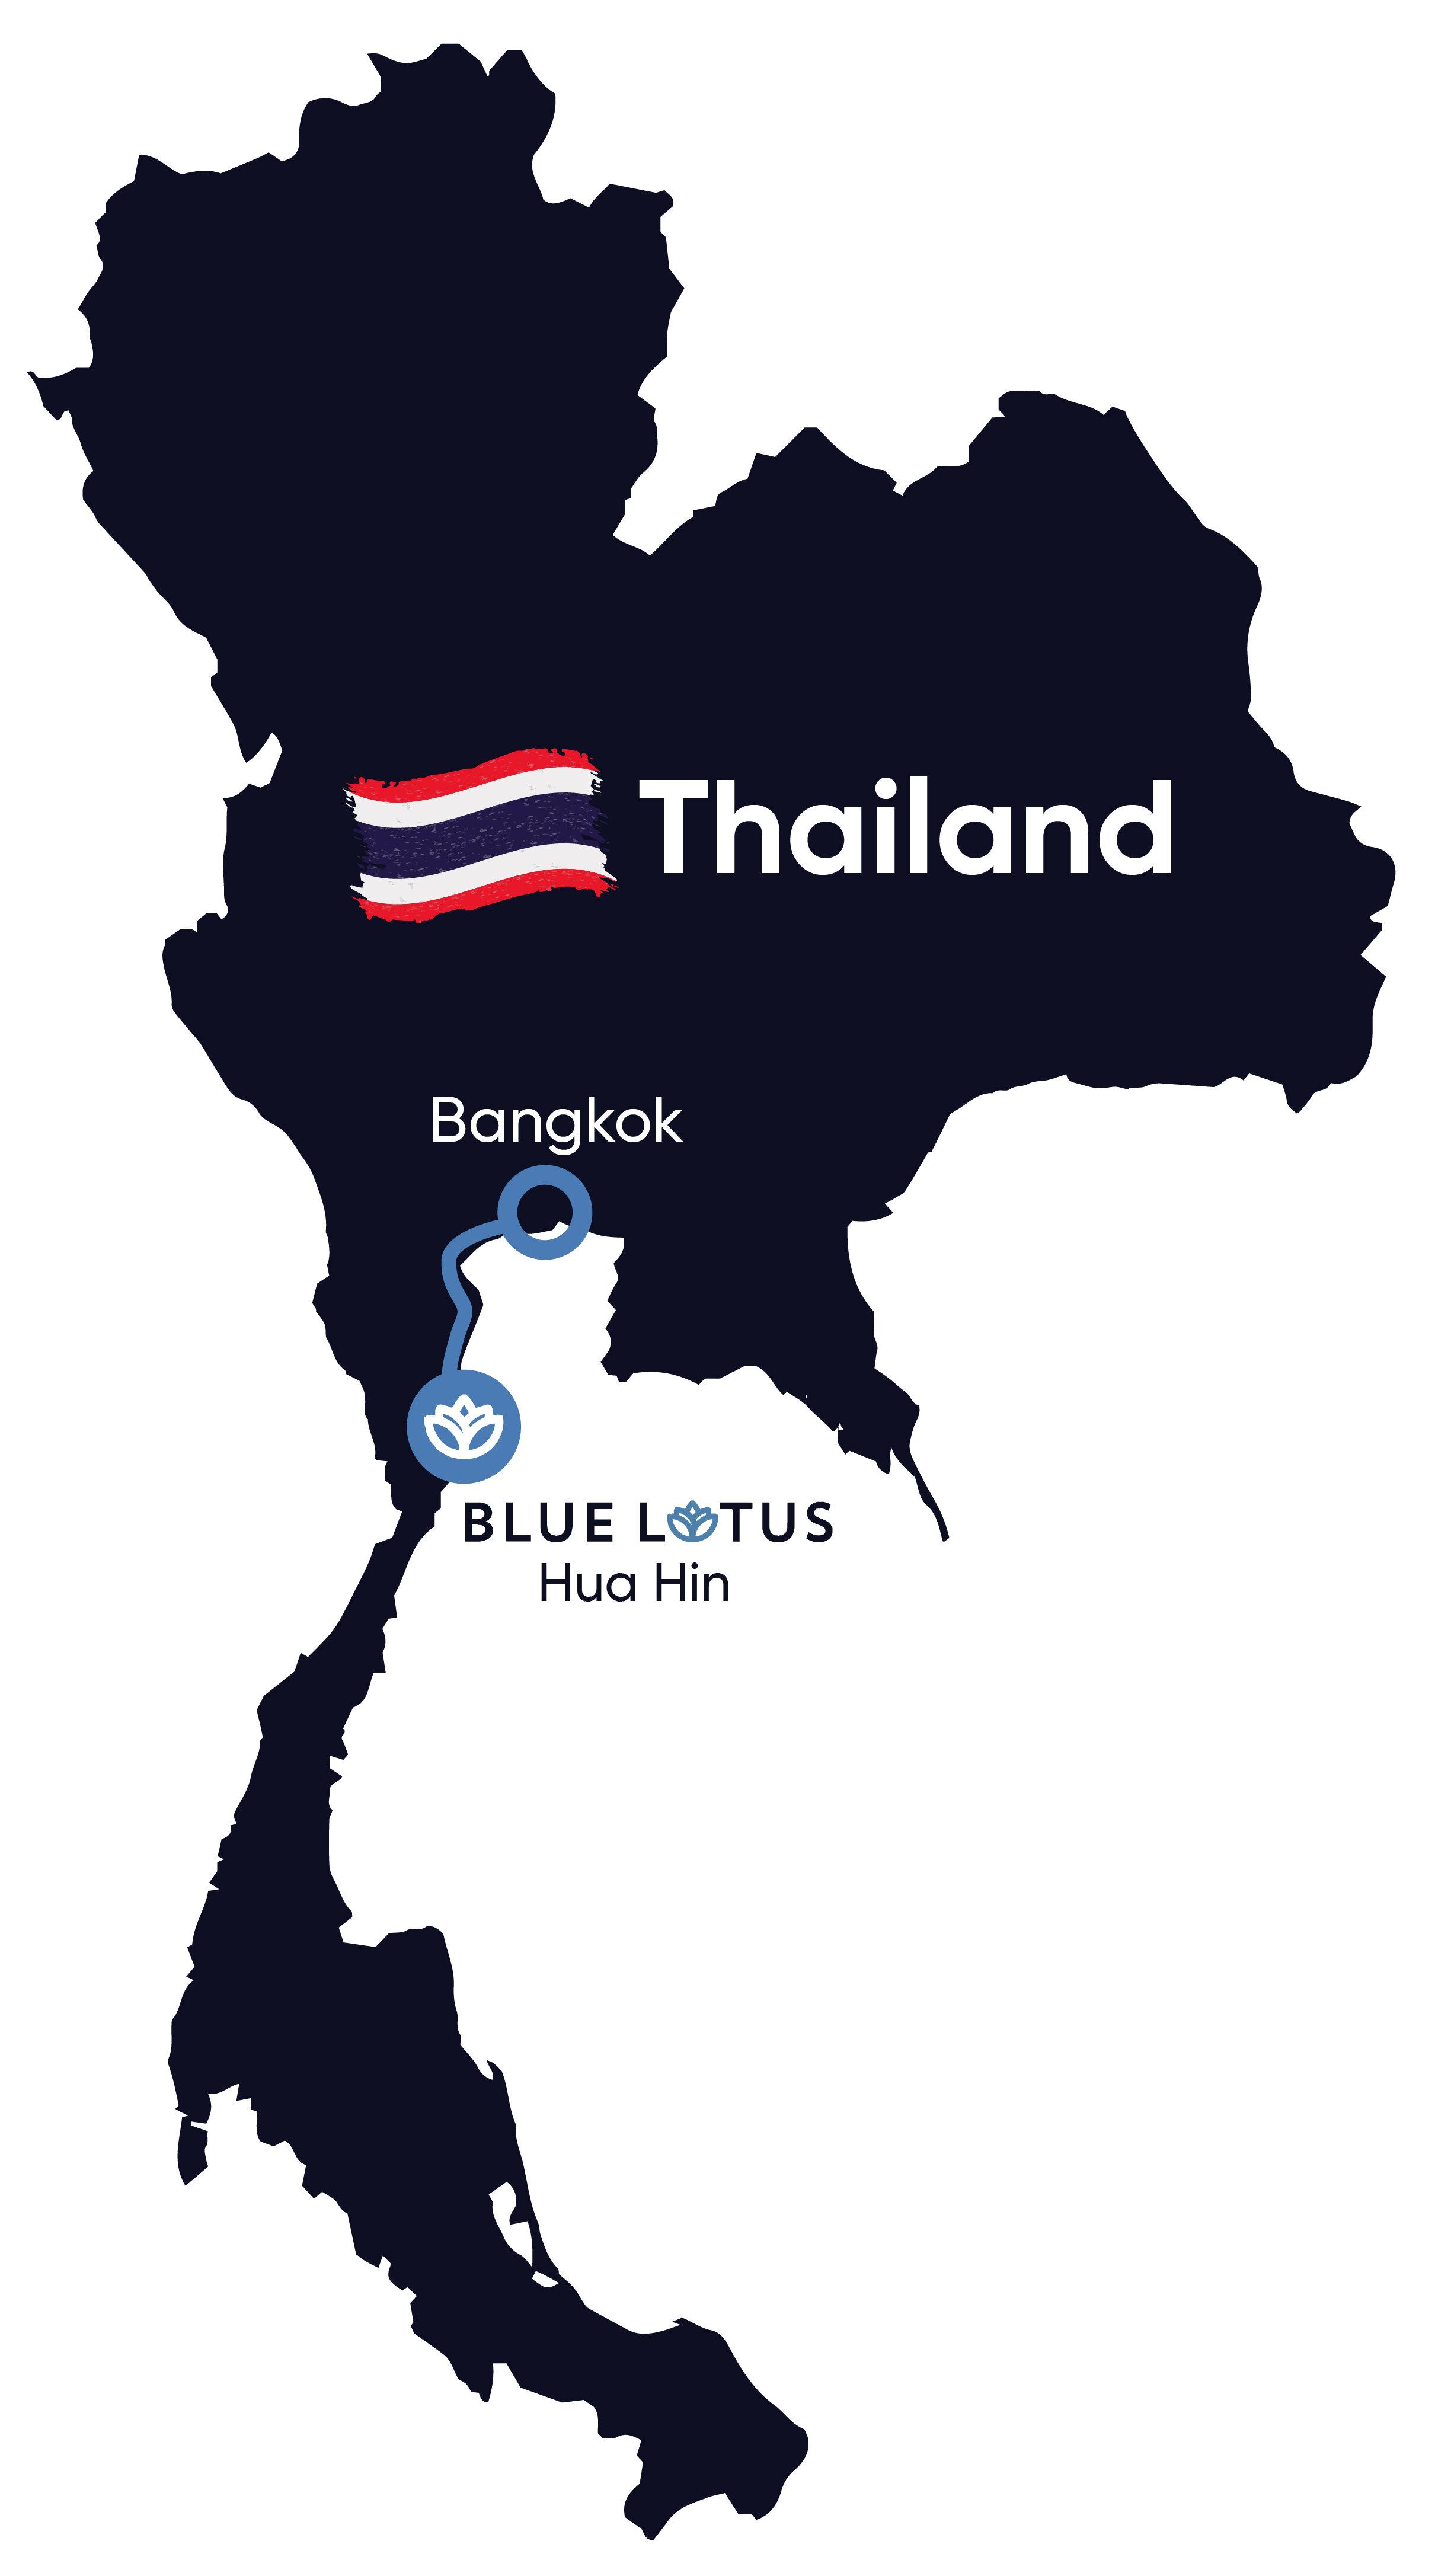 Thailand Blue Lotus Location.jpg